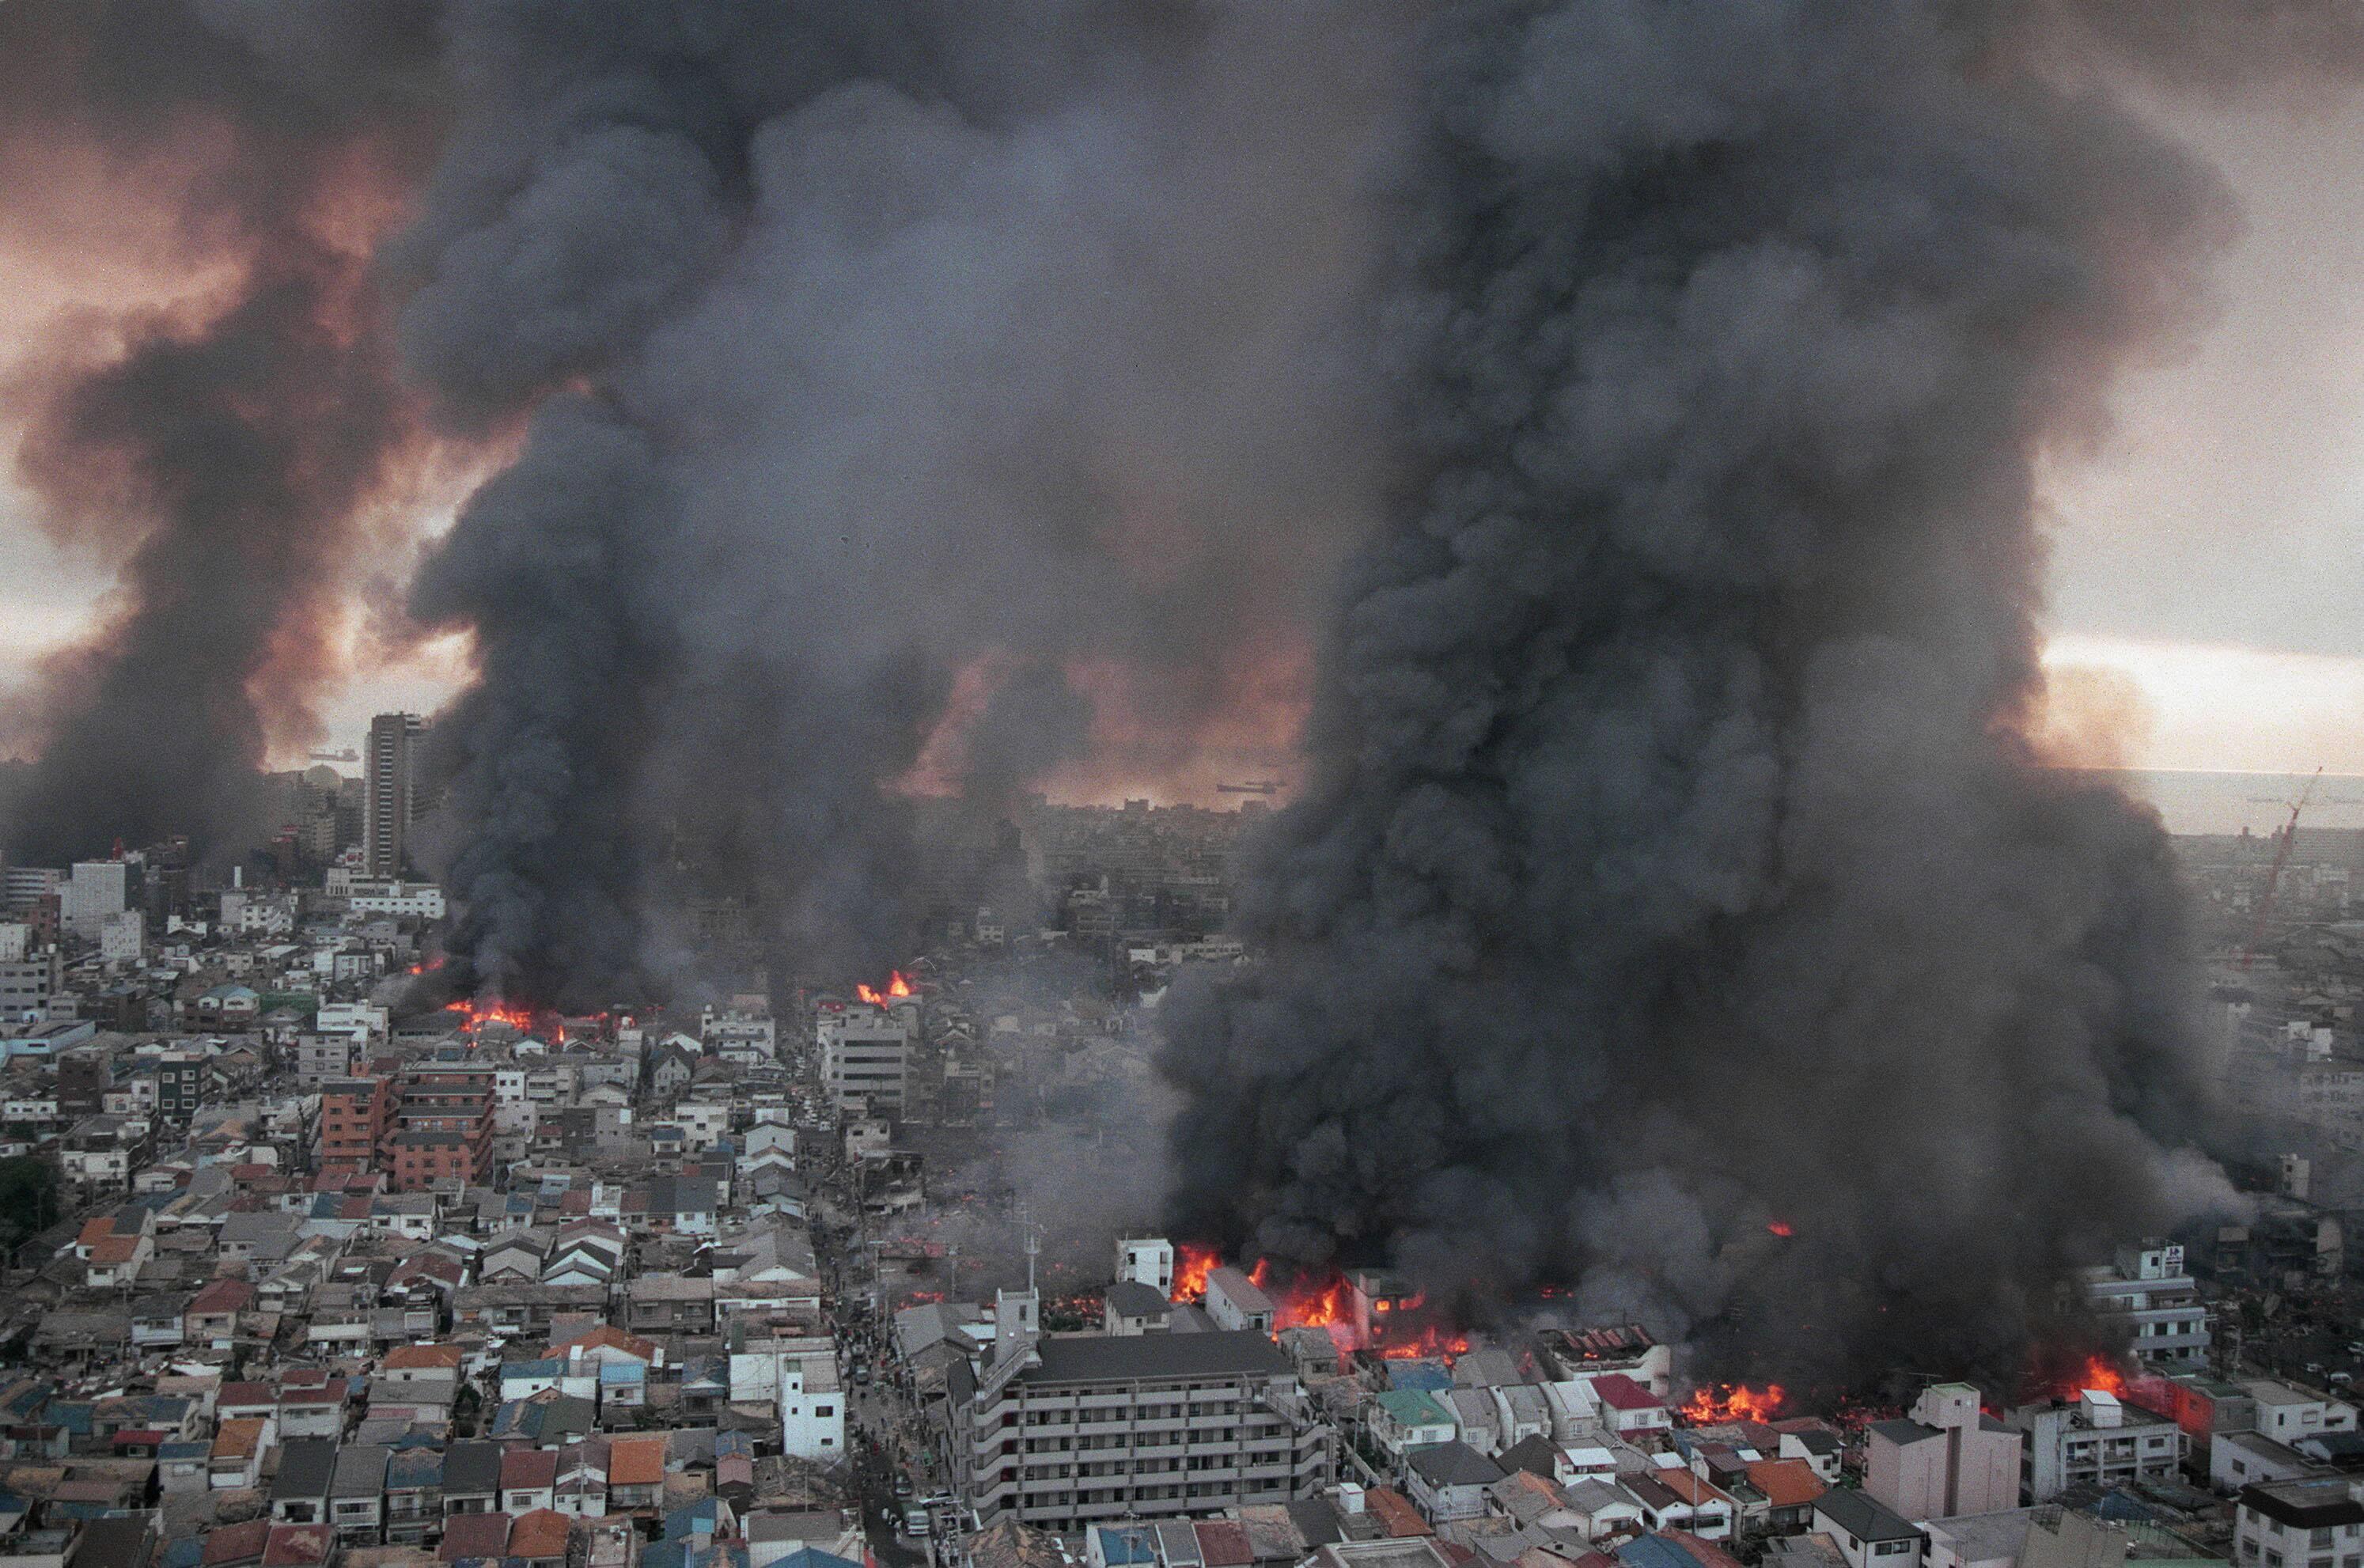 首都圏直下型地震で犯罪者が狙う「環状七号線」